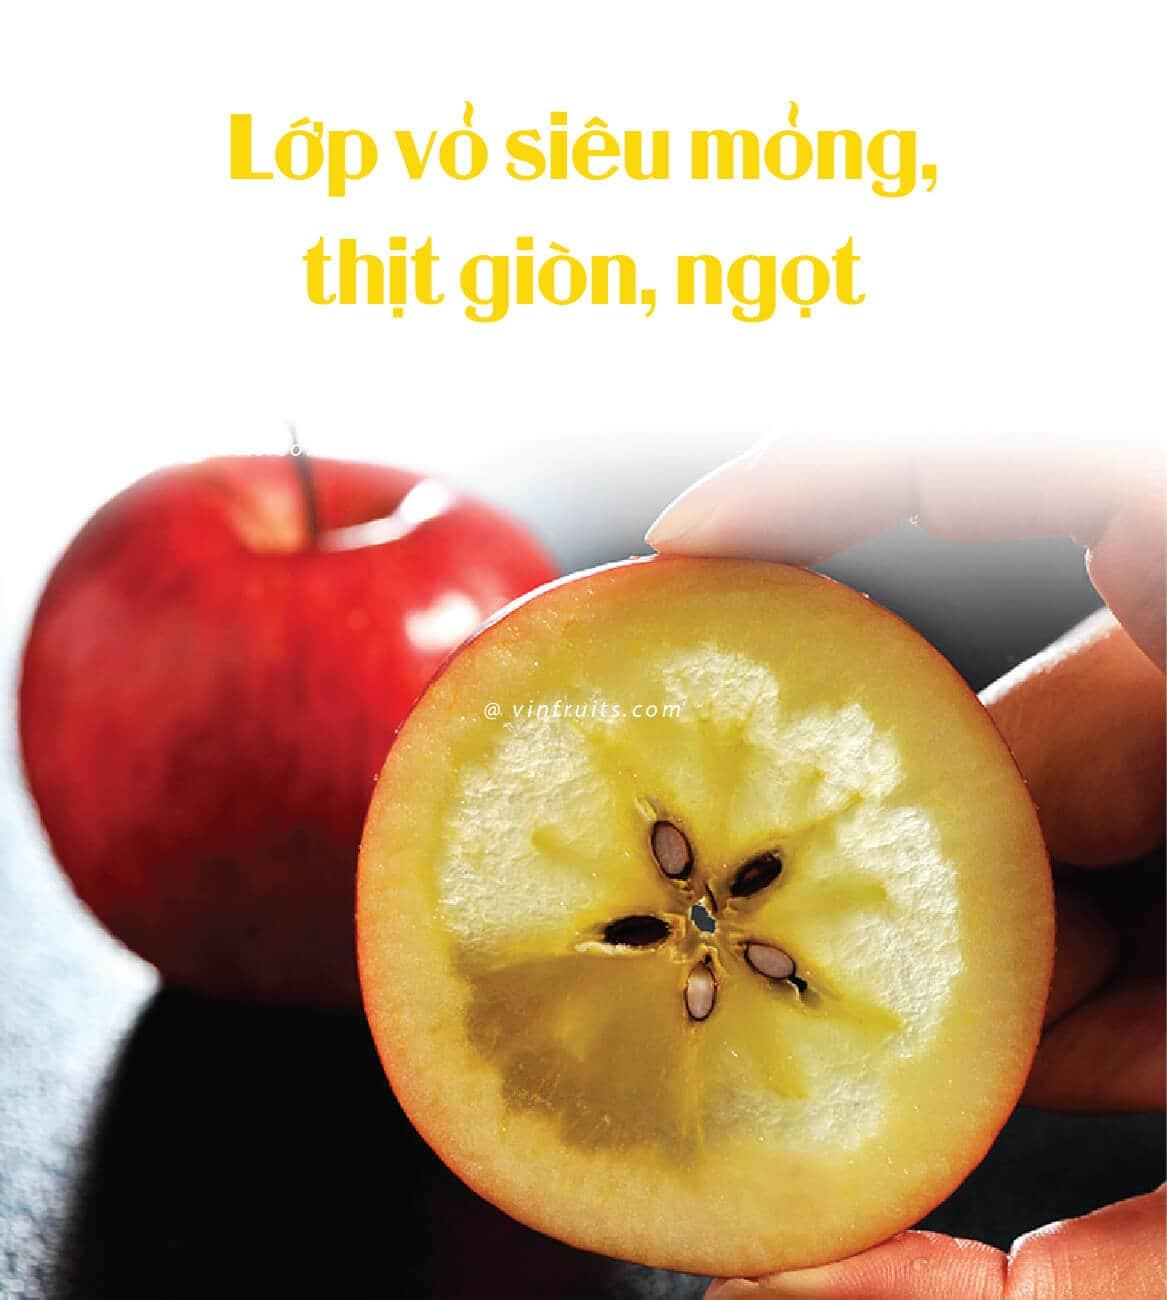 Tao mat Nhat Ban - vinfruits 2